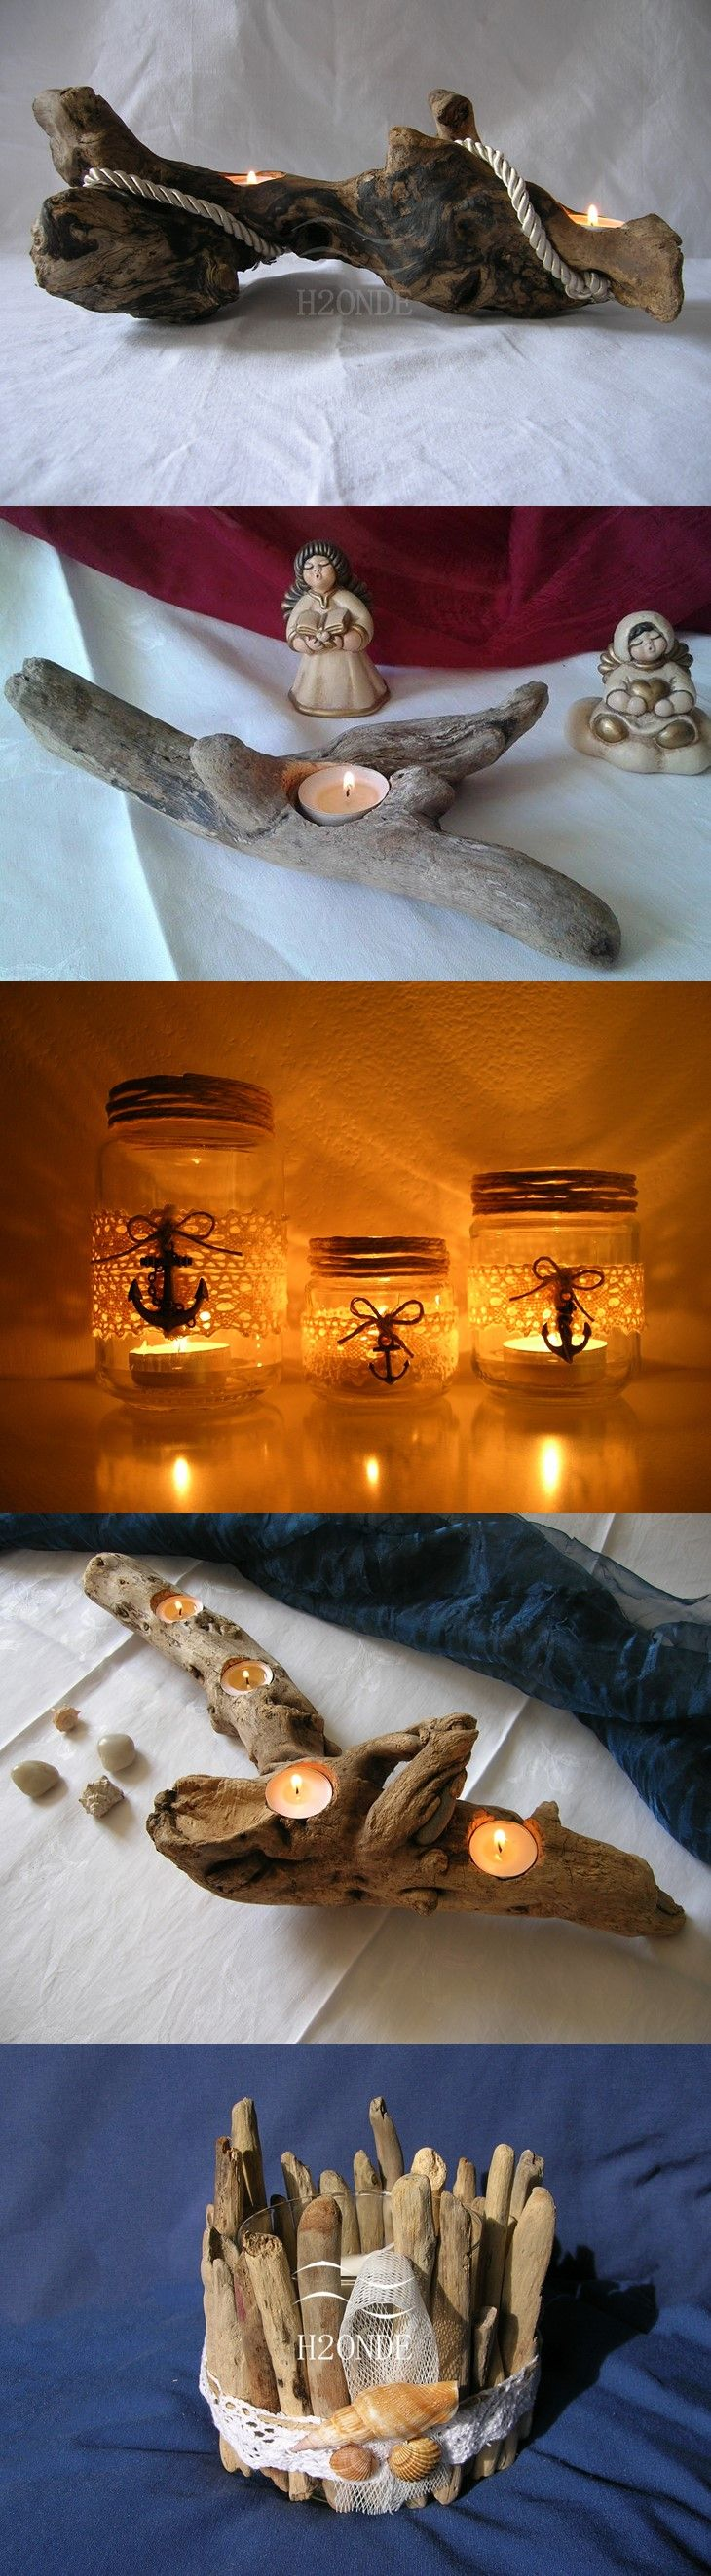 5 IDEAS FOR YOUR CENTERPIECE!  Unique home decor handmade from H2ONDE for you! [natural driftwood, glass, candle holder, modern design, rustic centerpiece, anchor, rope, ocean decor, marine decor, driftwood beach decor, tea light holder, coastal decor, wedding, desk, mantel fireplace, romantic idea]